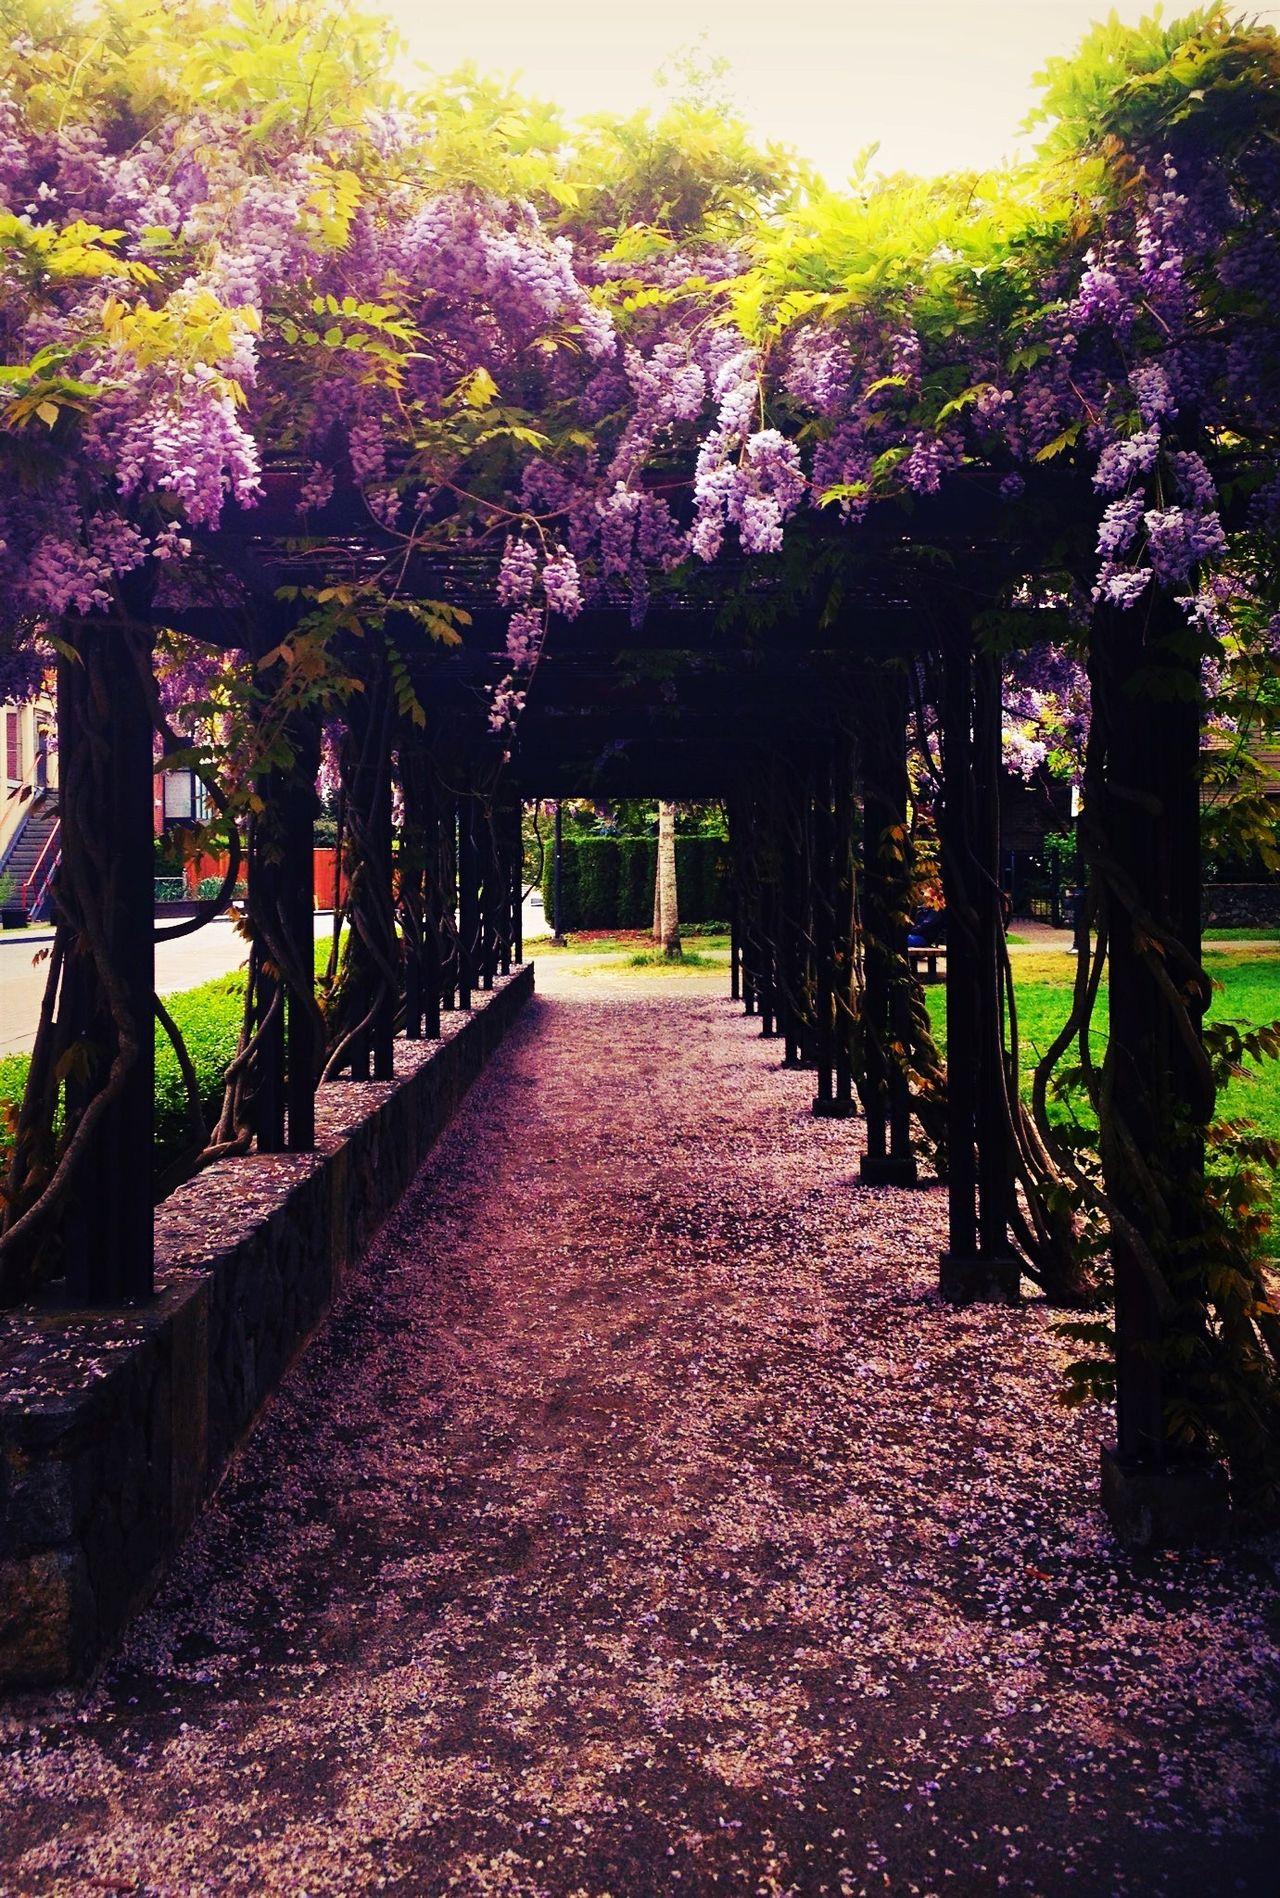 Wisteria Flower Purple Flower Archway Romantic Landscape Love Tunnel Walkway The Great Outdoors - 2017 EyeEm Awards